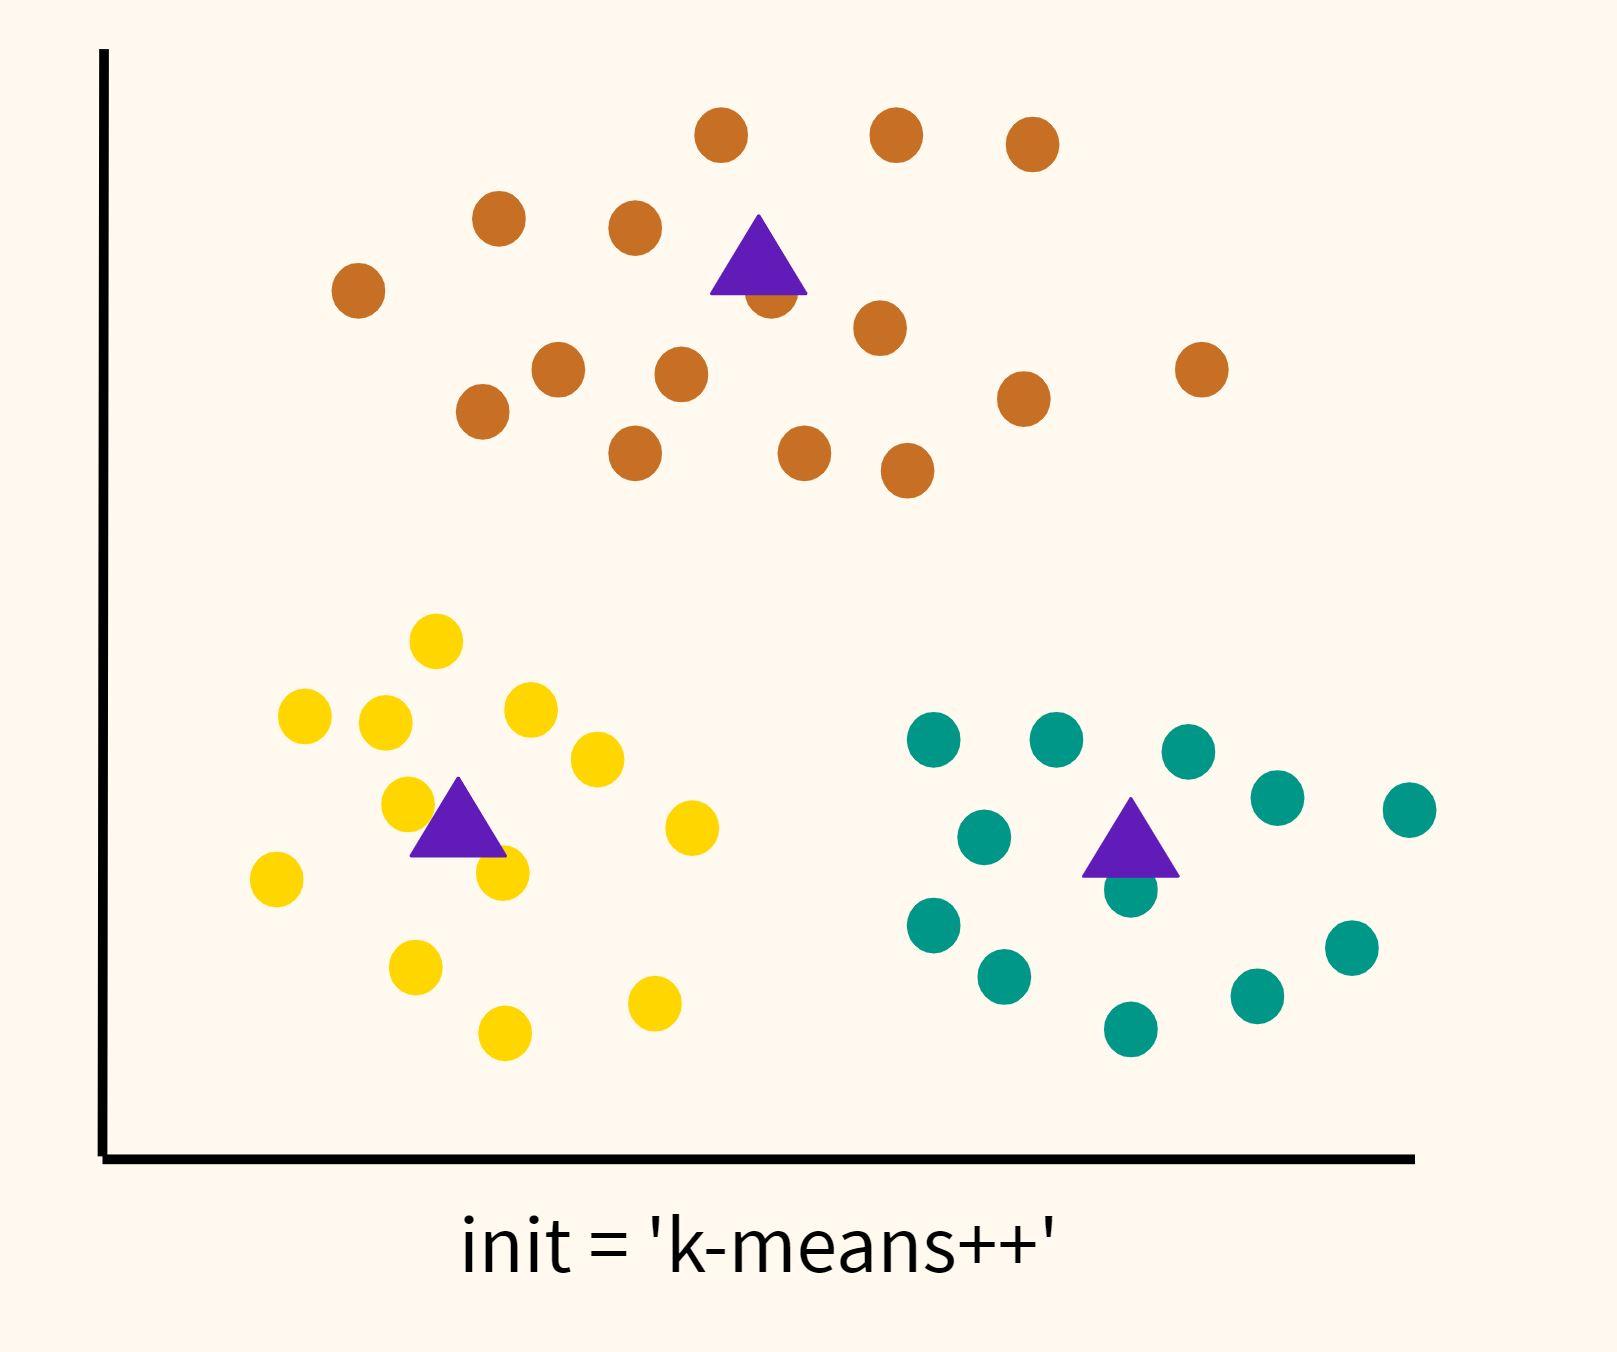 инициализация центроидов методом k-means++ (init = 'k-means++')